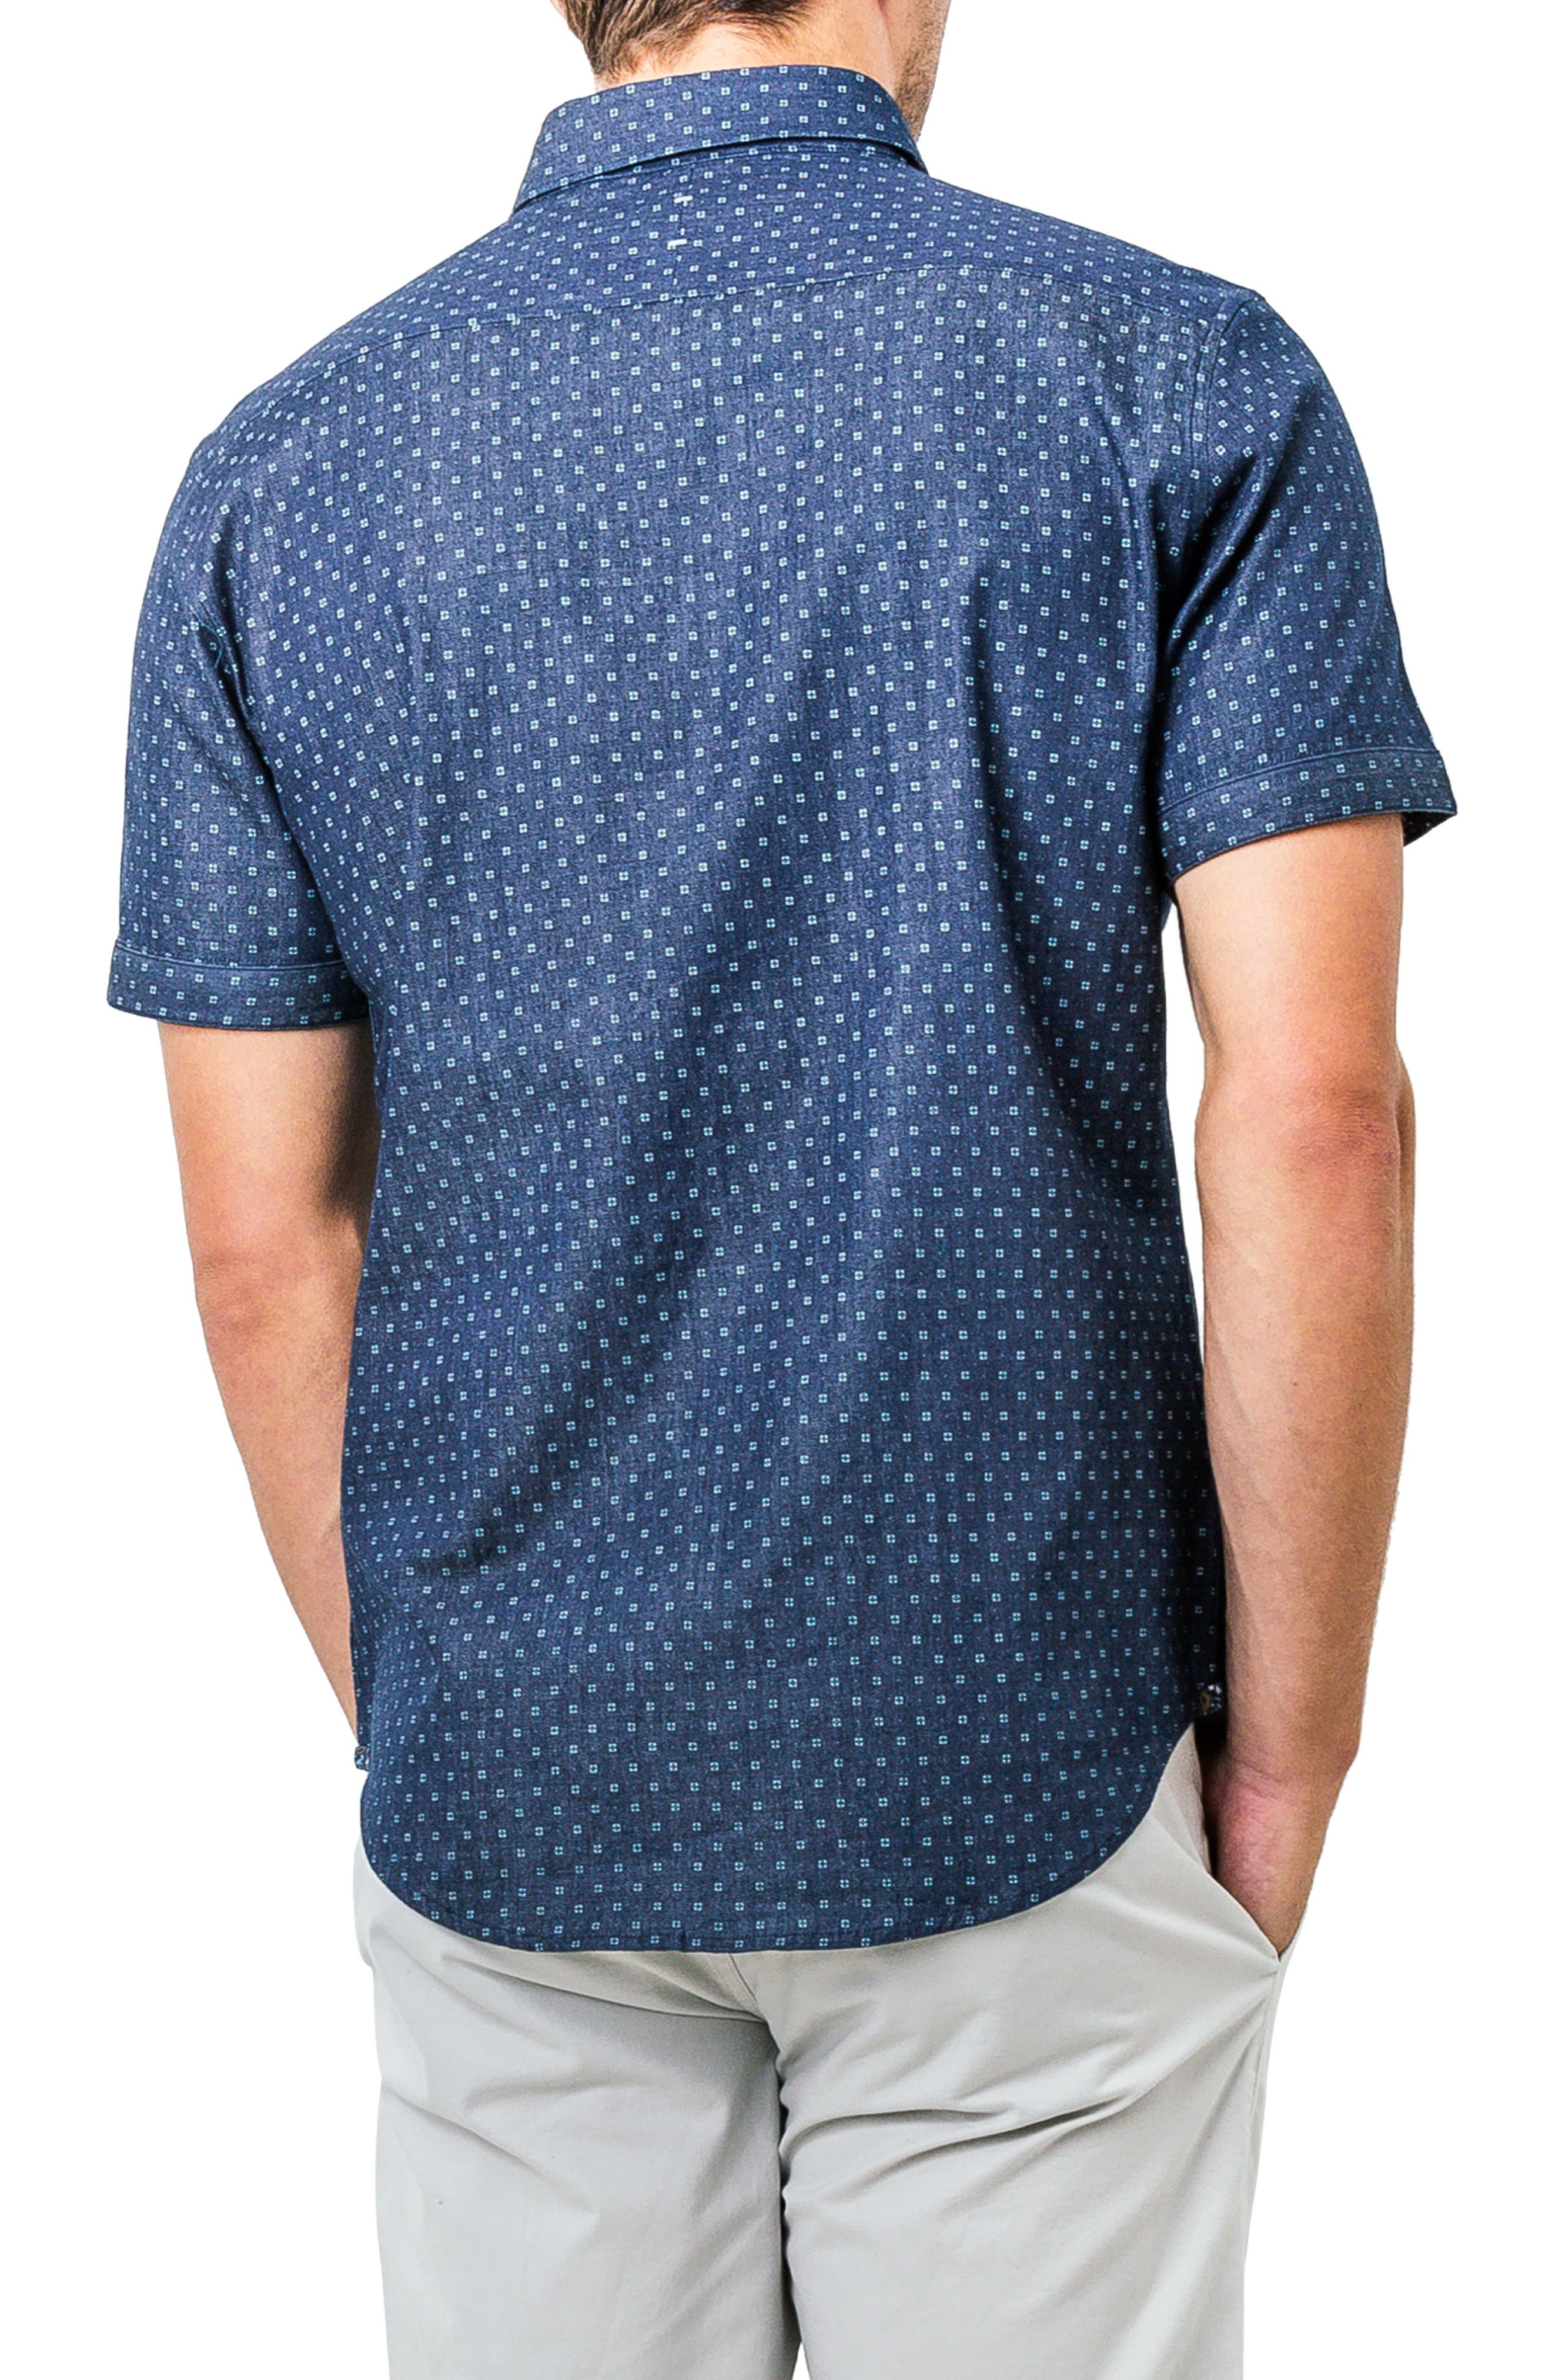 Innervision Woven Shirt,                             Alternate thumbnail 2, color,                             410